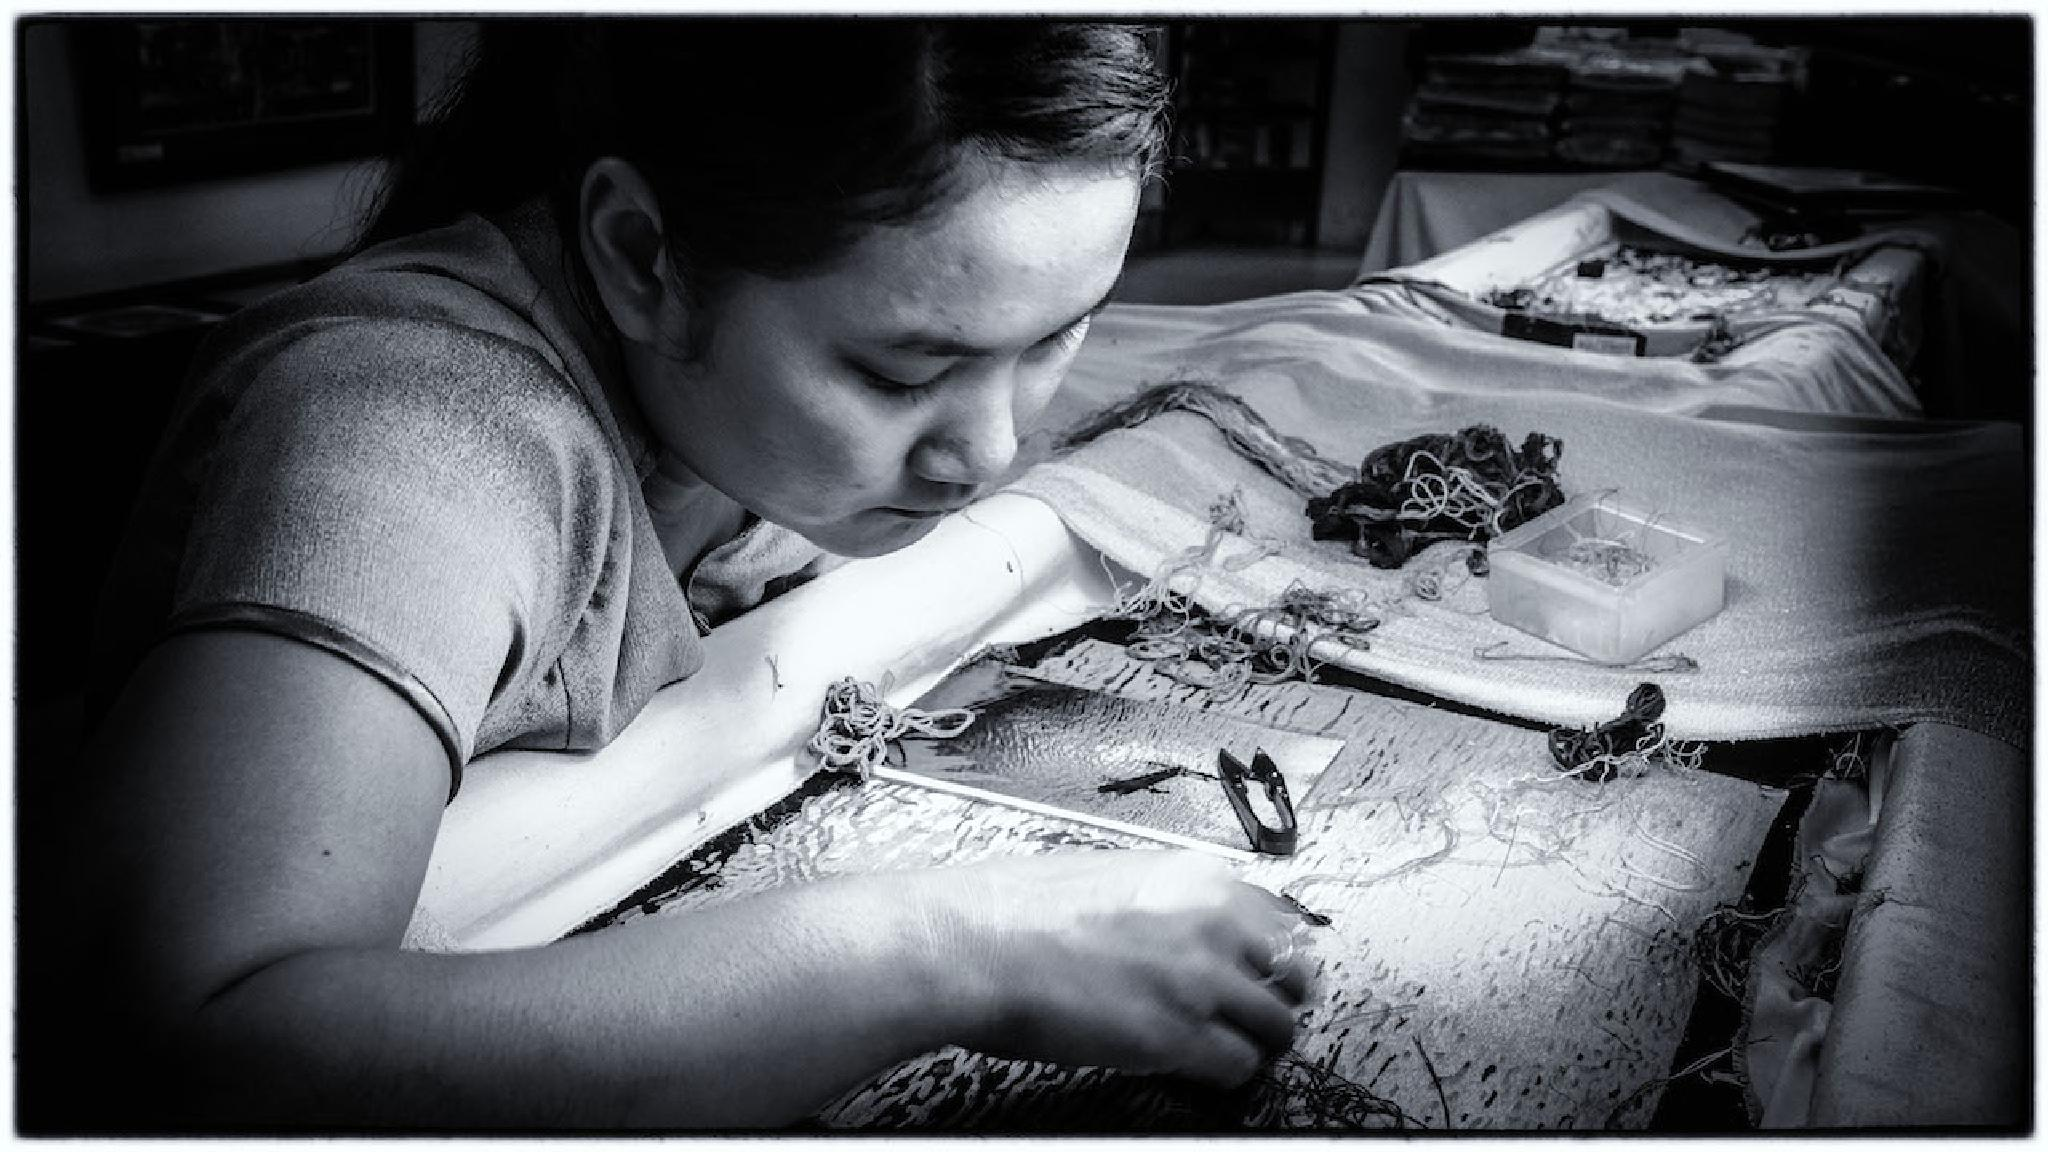 Vietnamese Girl at Work. by tapasbas